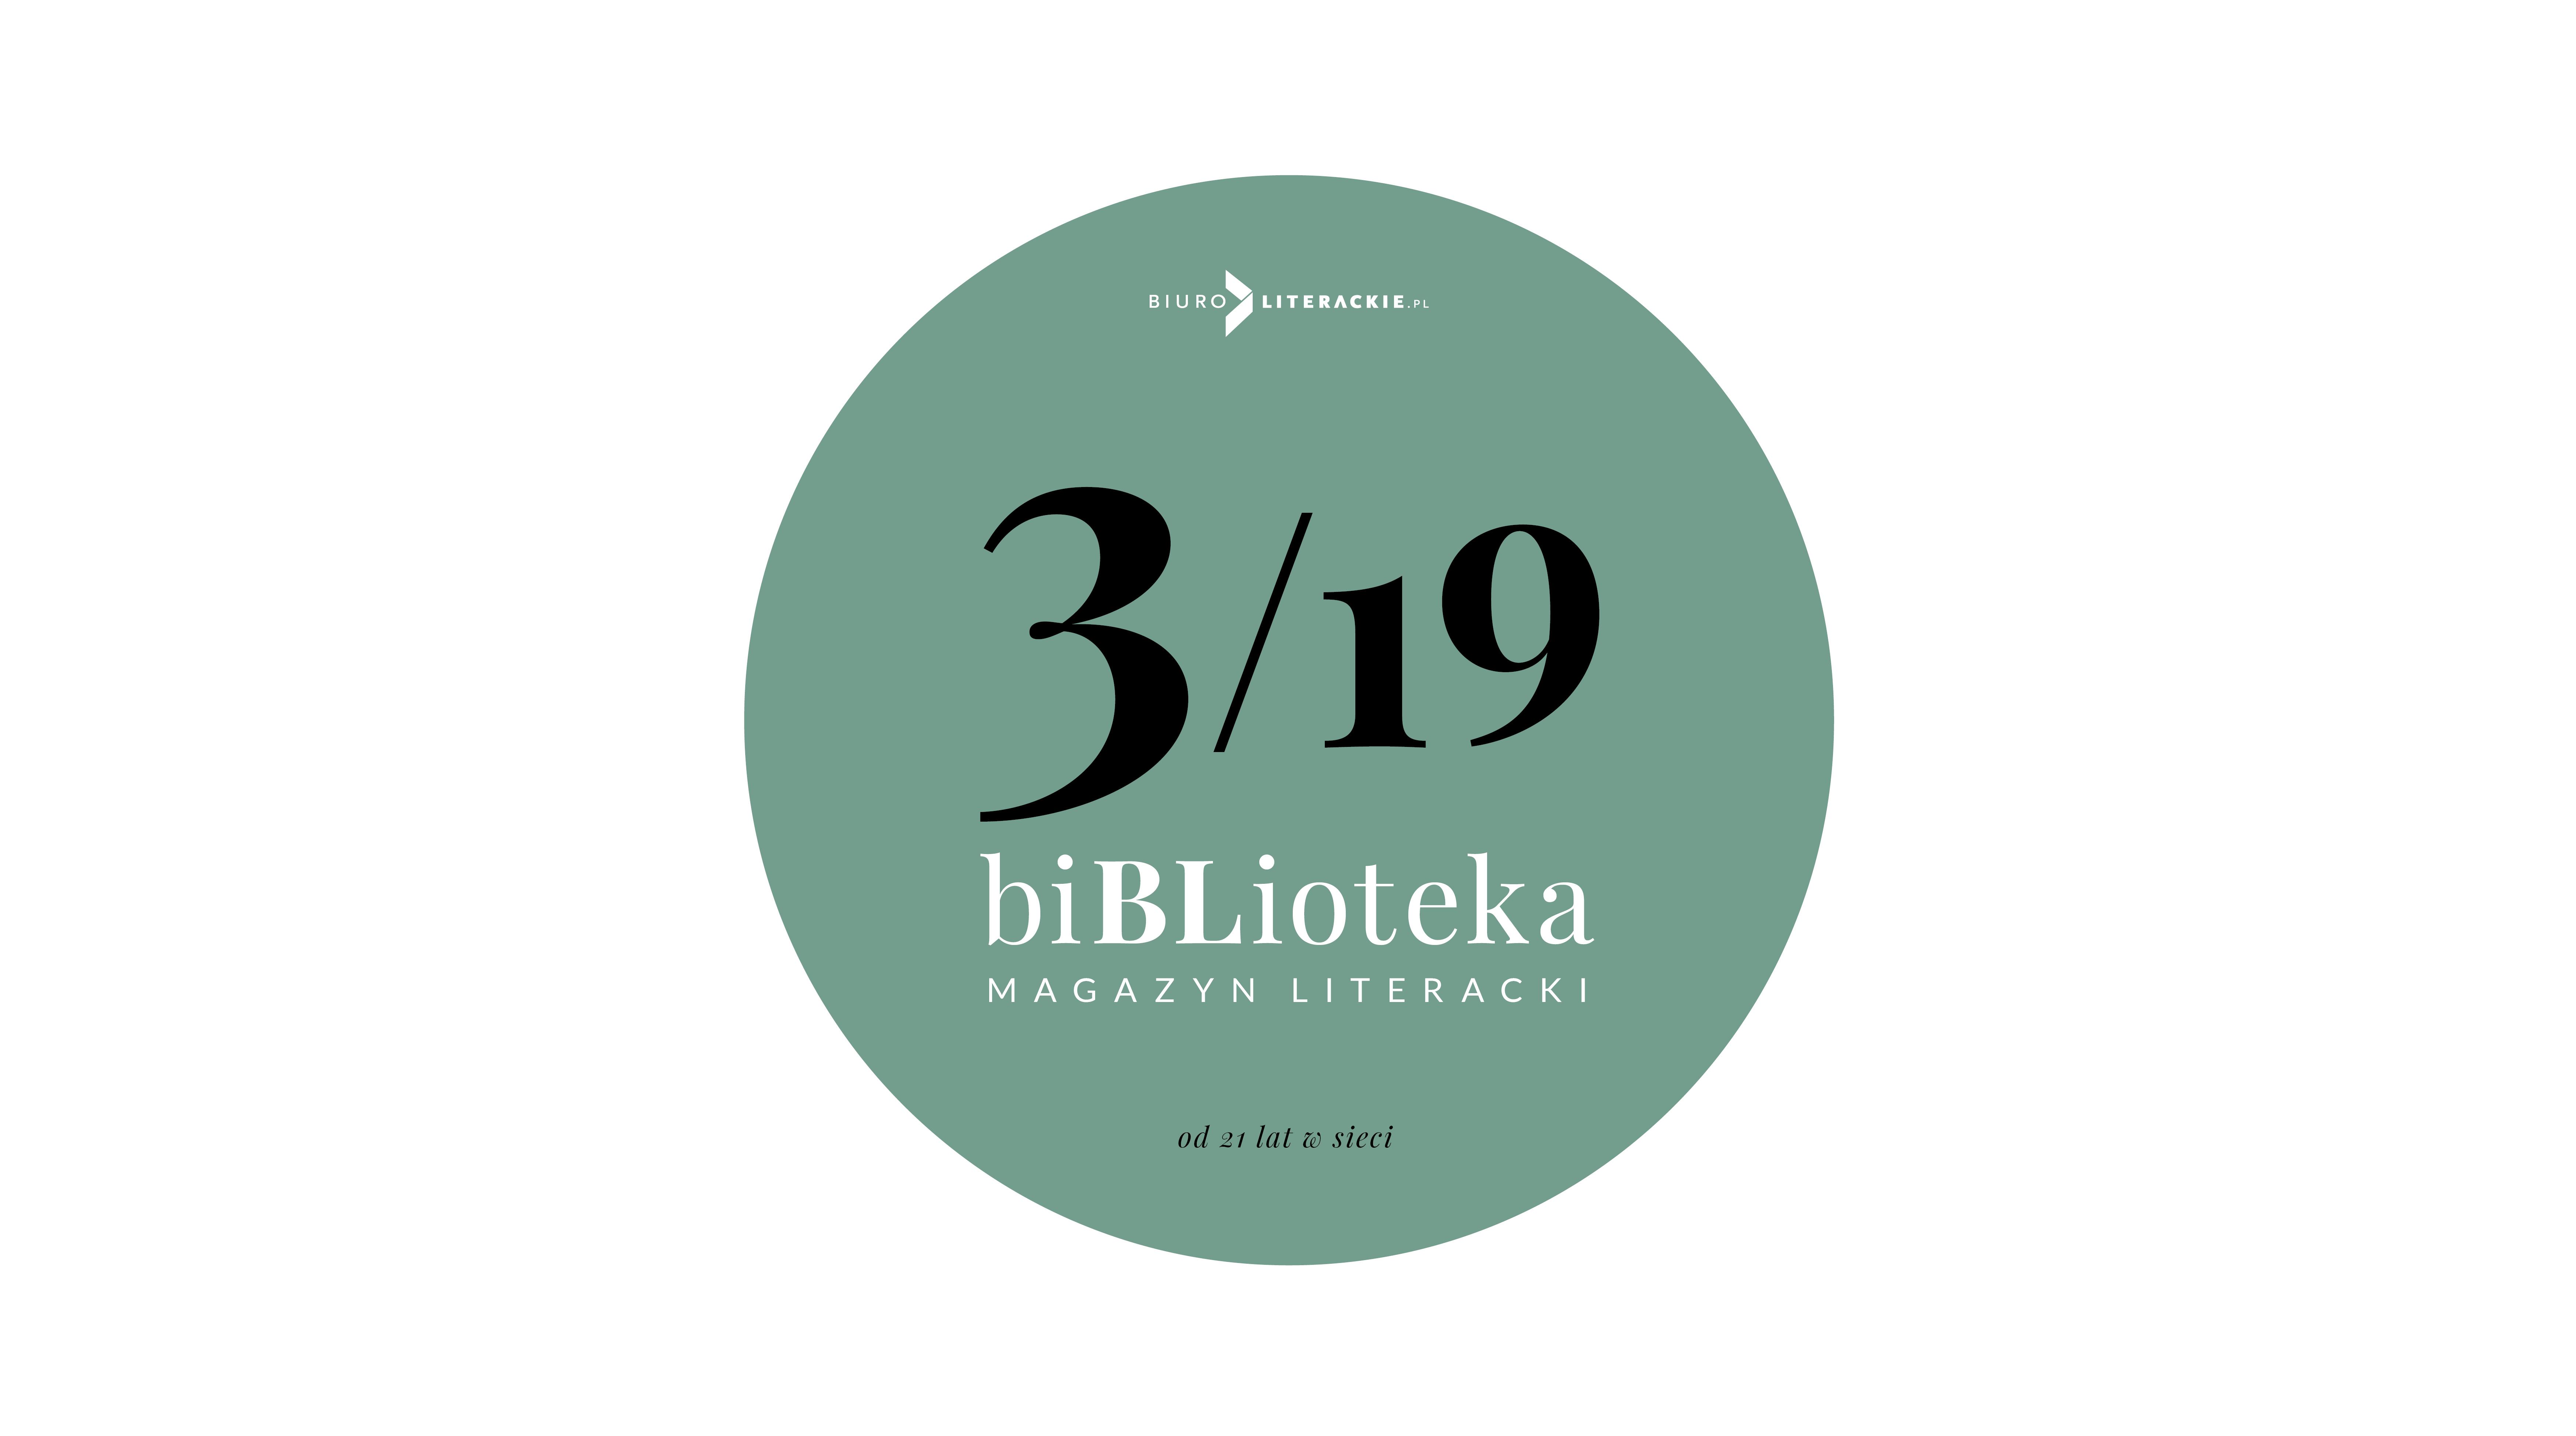 BL Info 2019.02.21 biBLioteka nr 3 2019__www_top